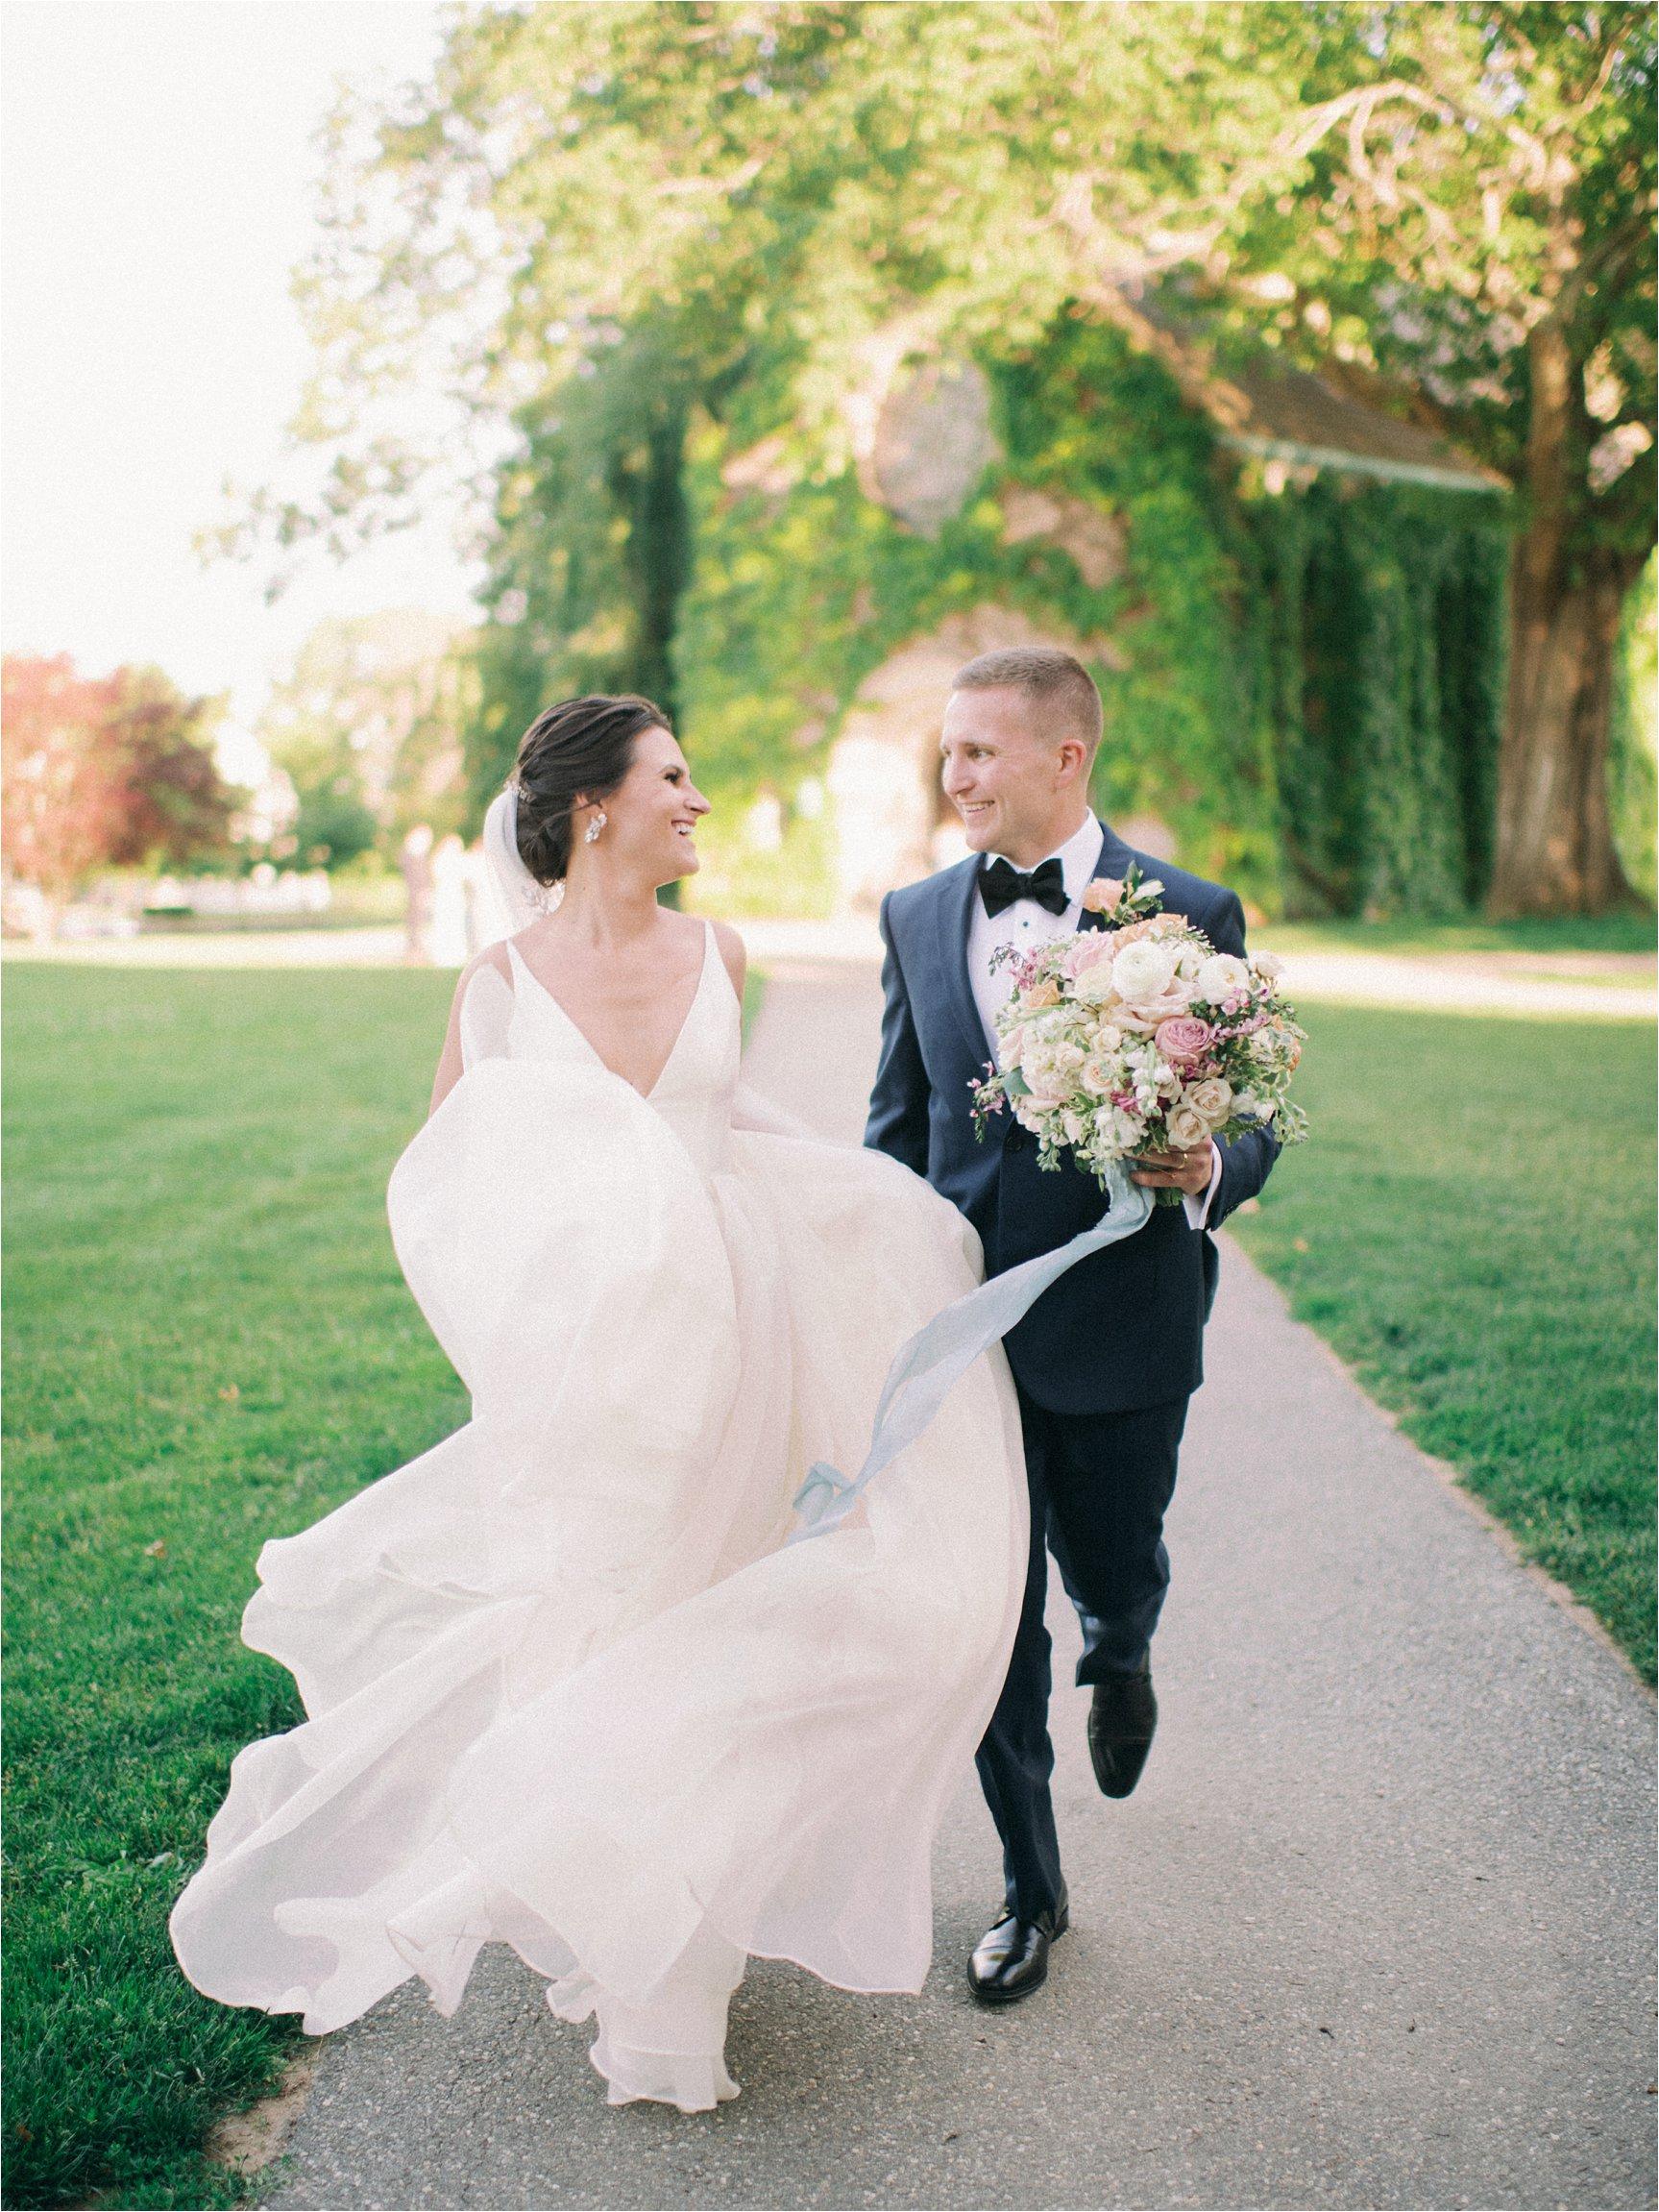 Lord_Thompson_Manor_Wedding095.JPG